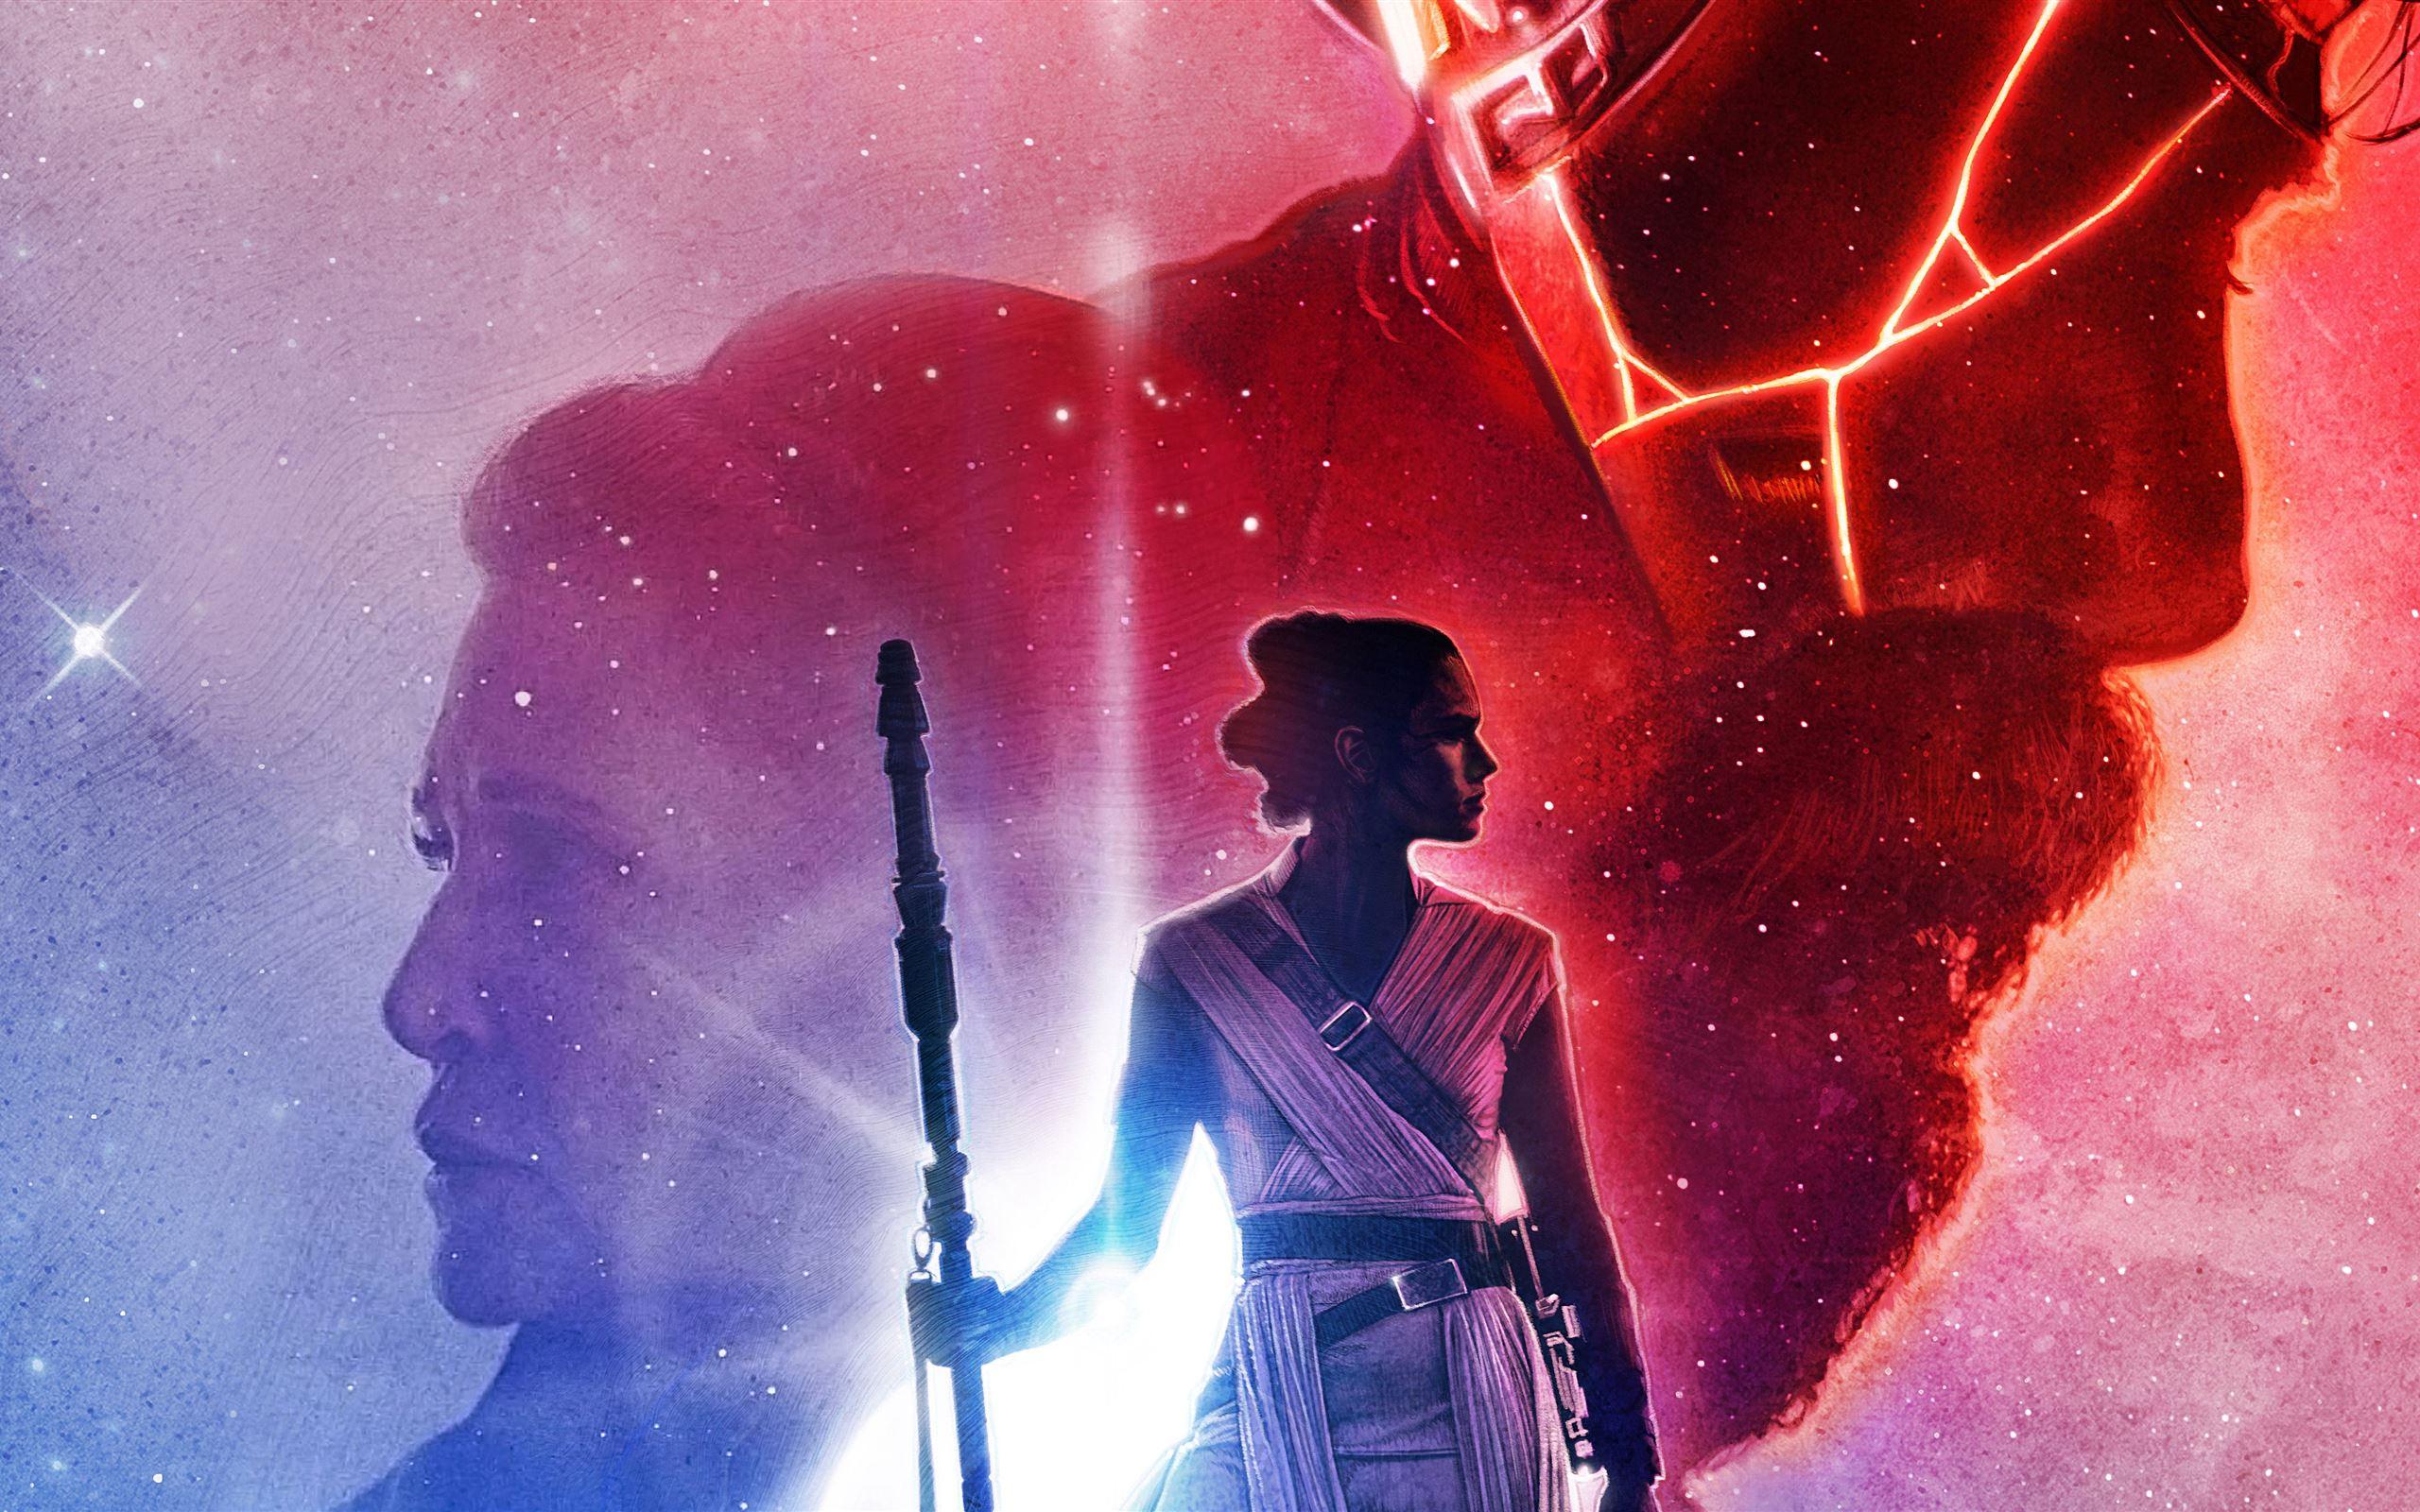 Star Wars The Last Jedi Art 5k Macbook Air Wallpaper Download Allmacwallpaper